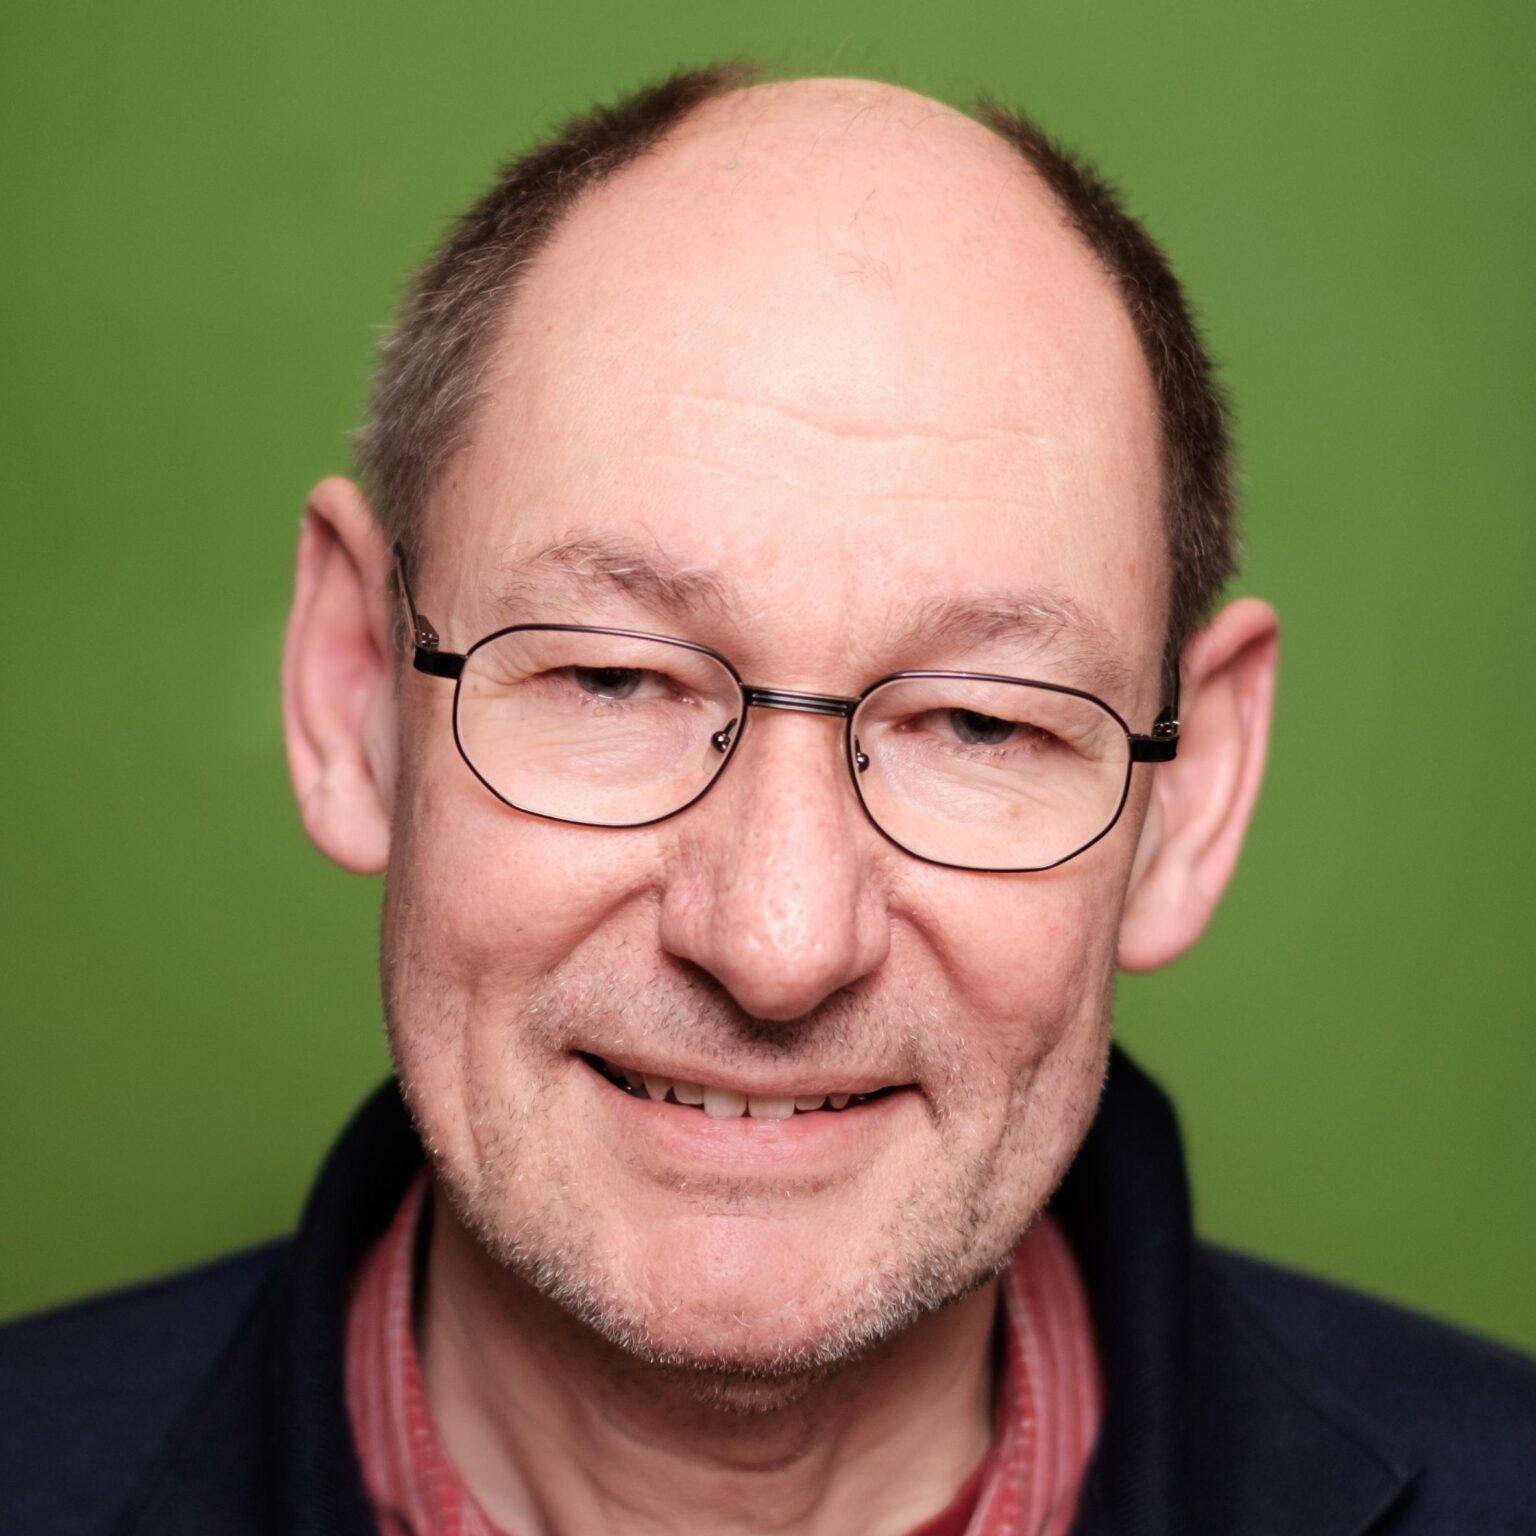 Josef Ganslmeier